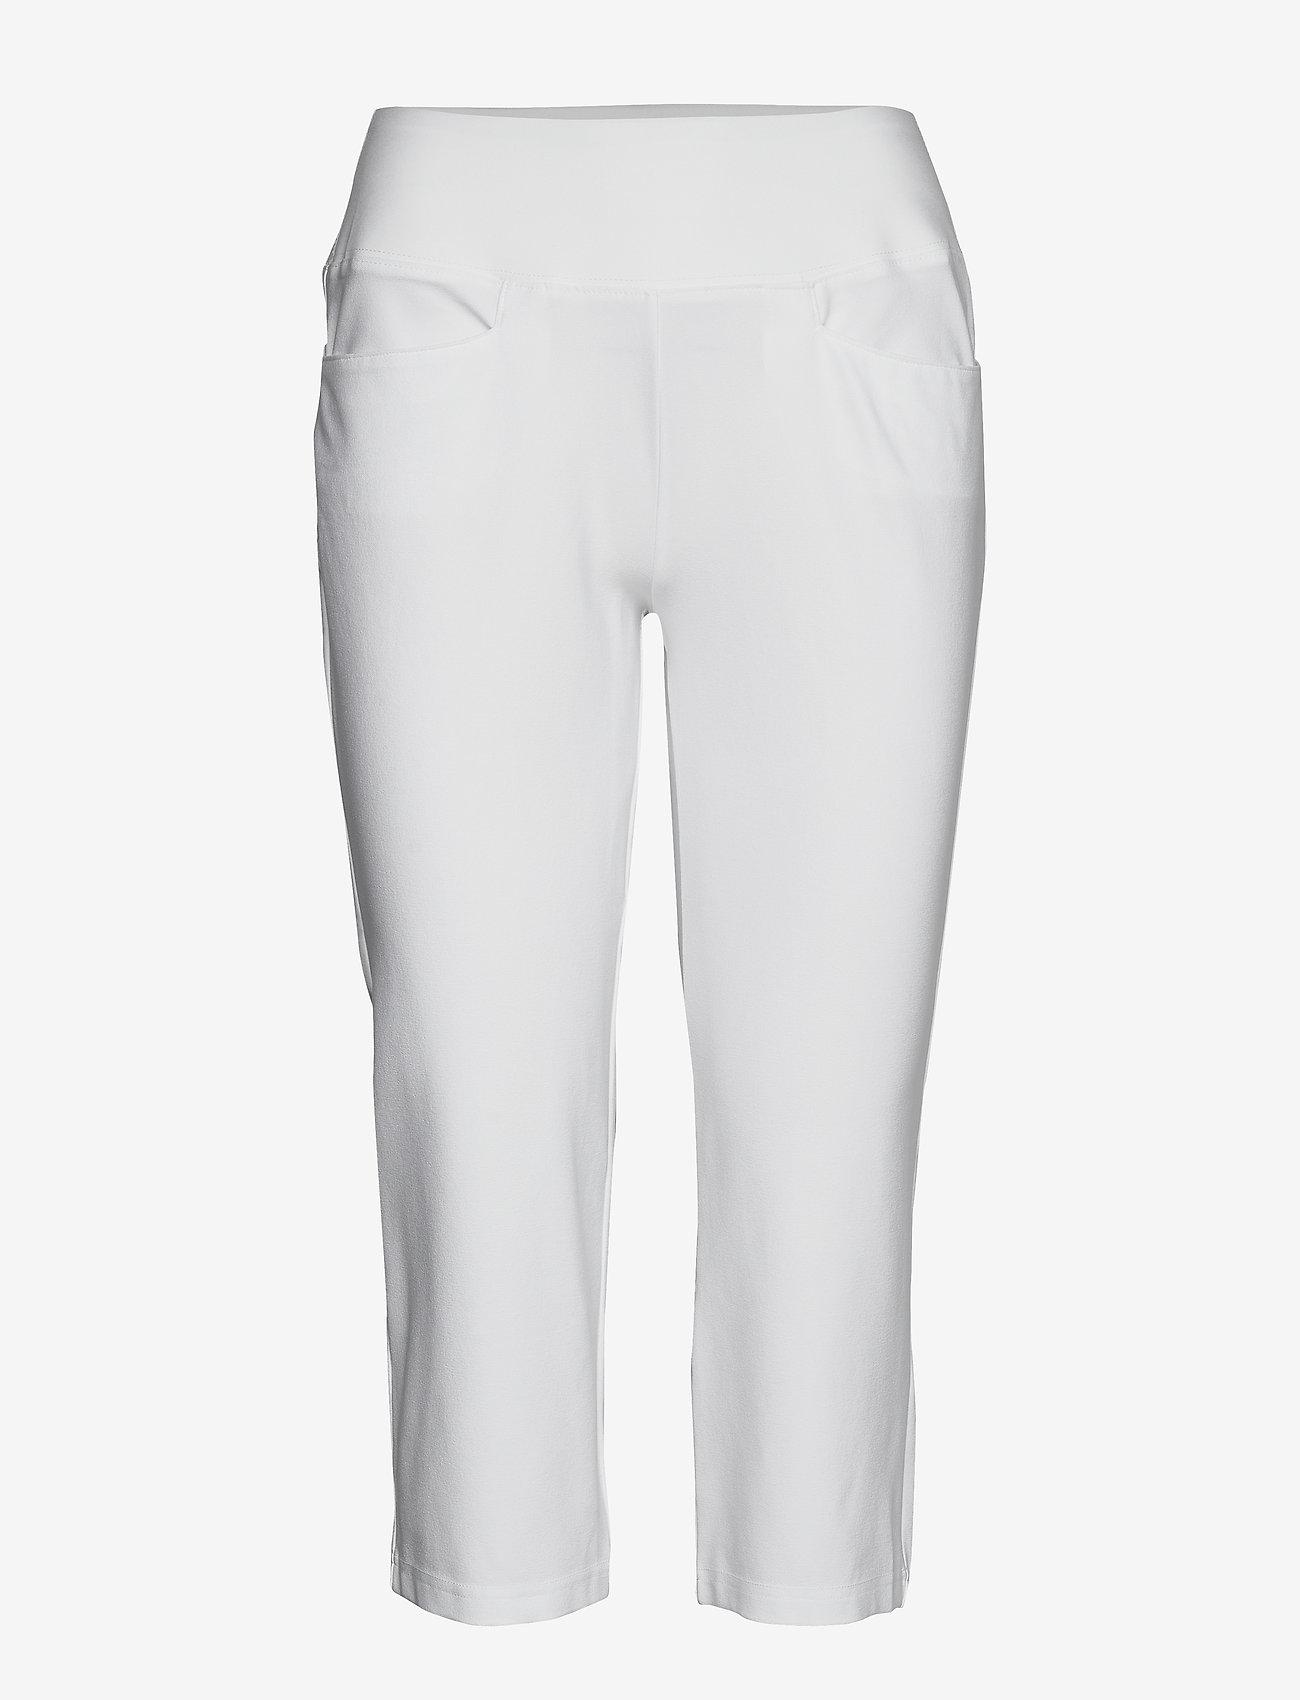 PUMA Golf - PWRSHAPE Capri - golfbroeken - bright white - 0